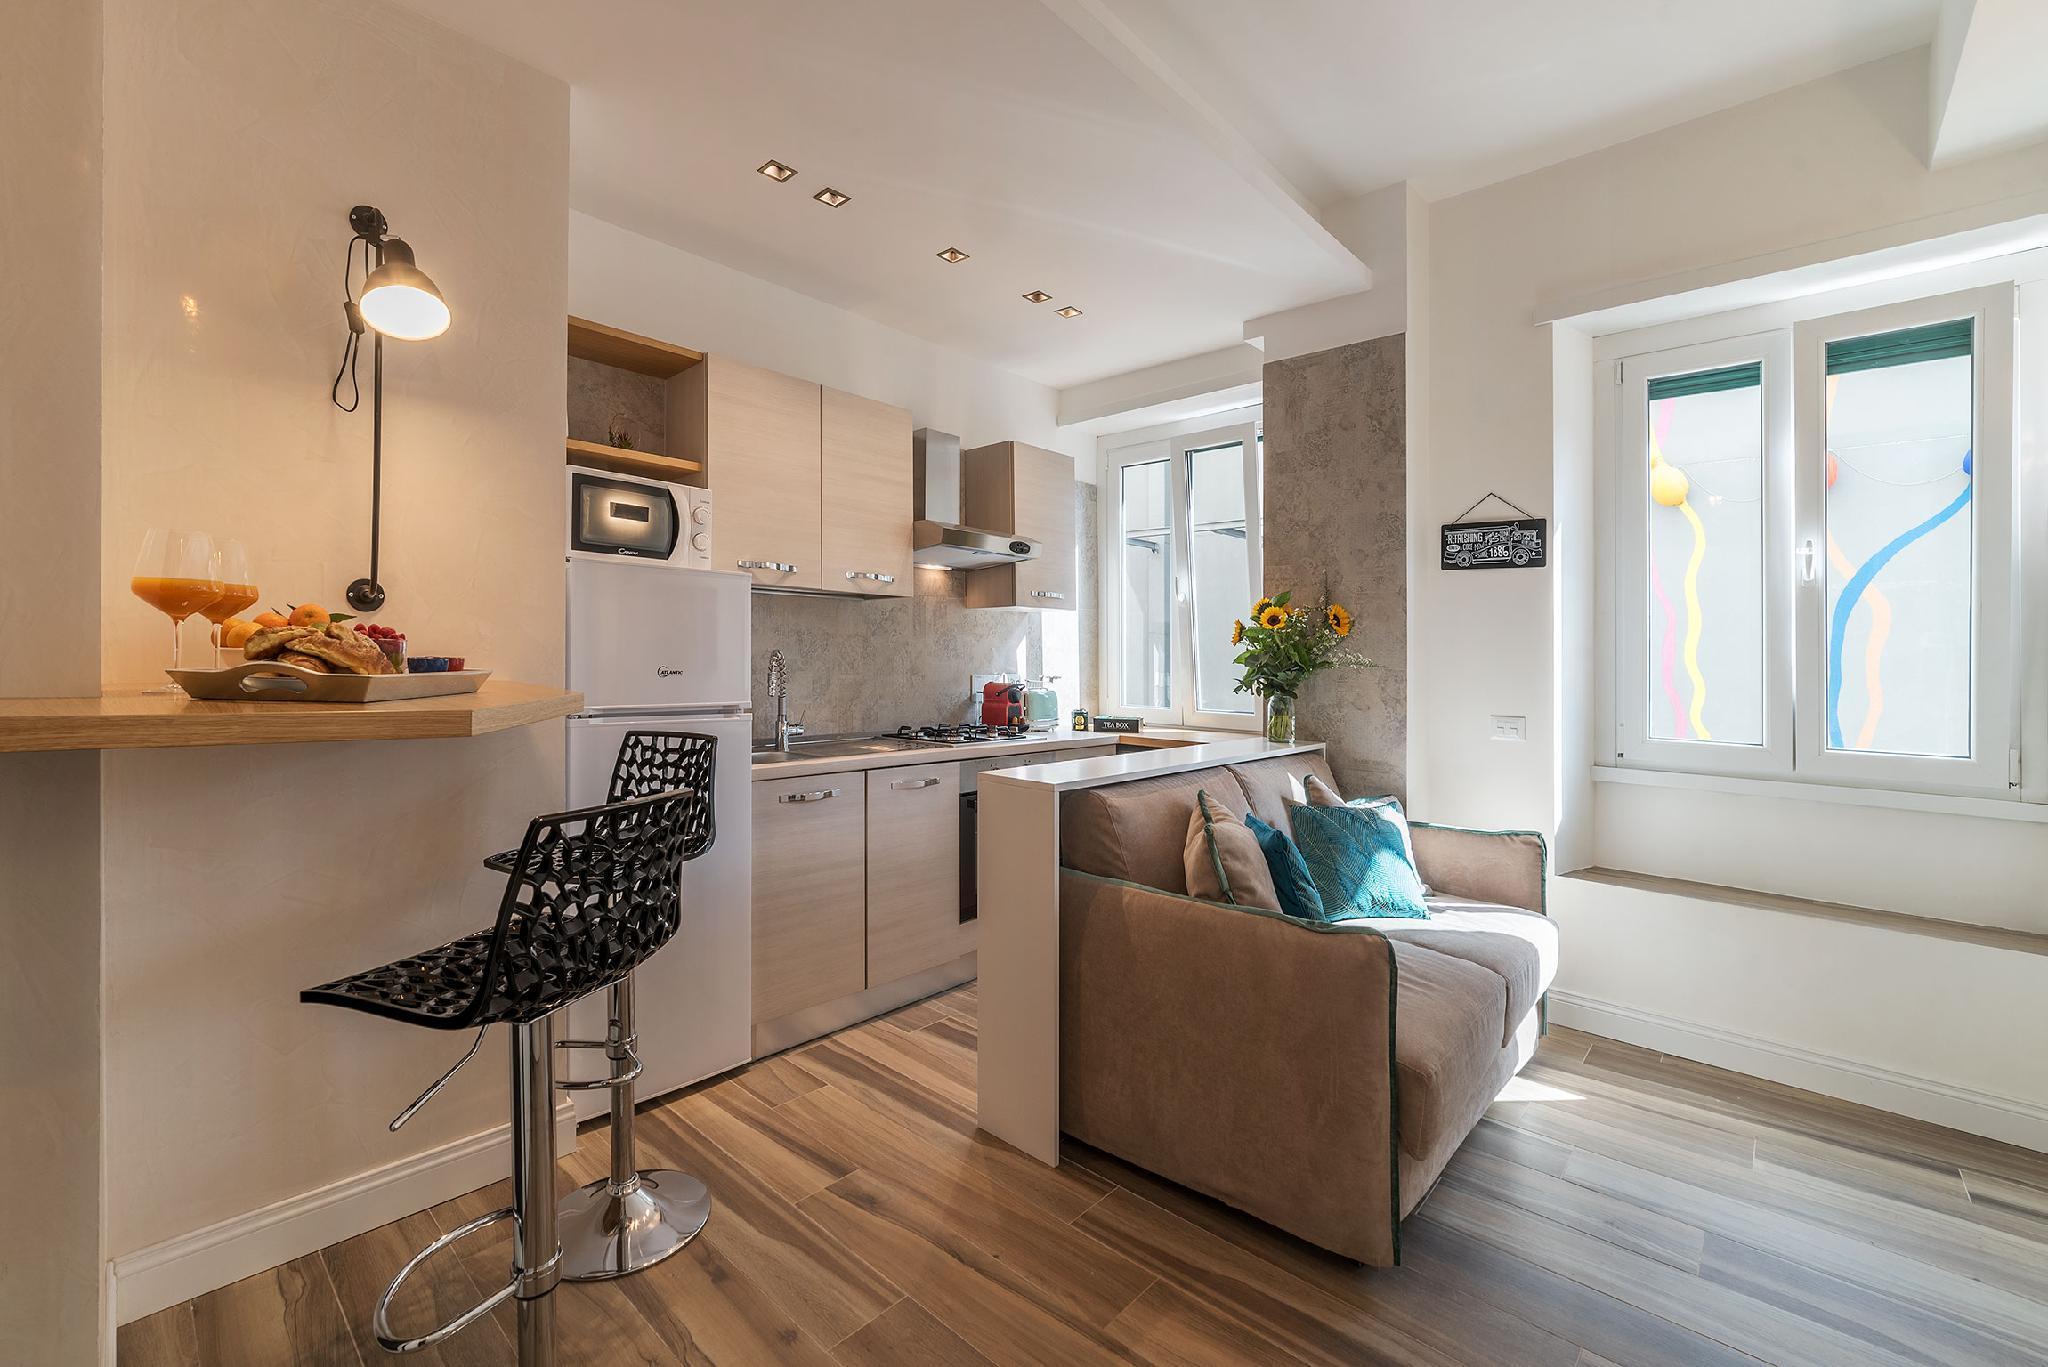 Appia New Cozy Apartment